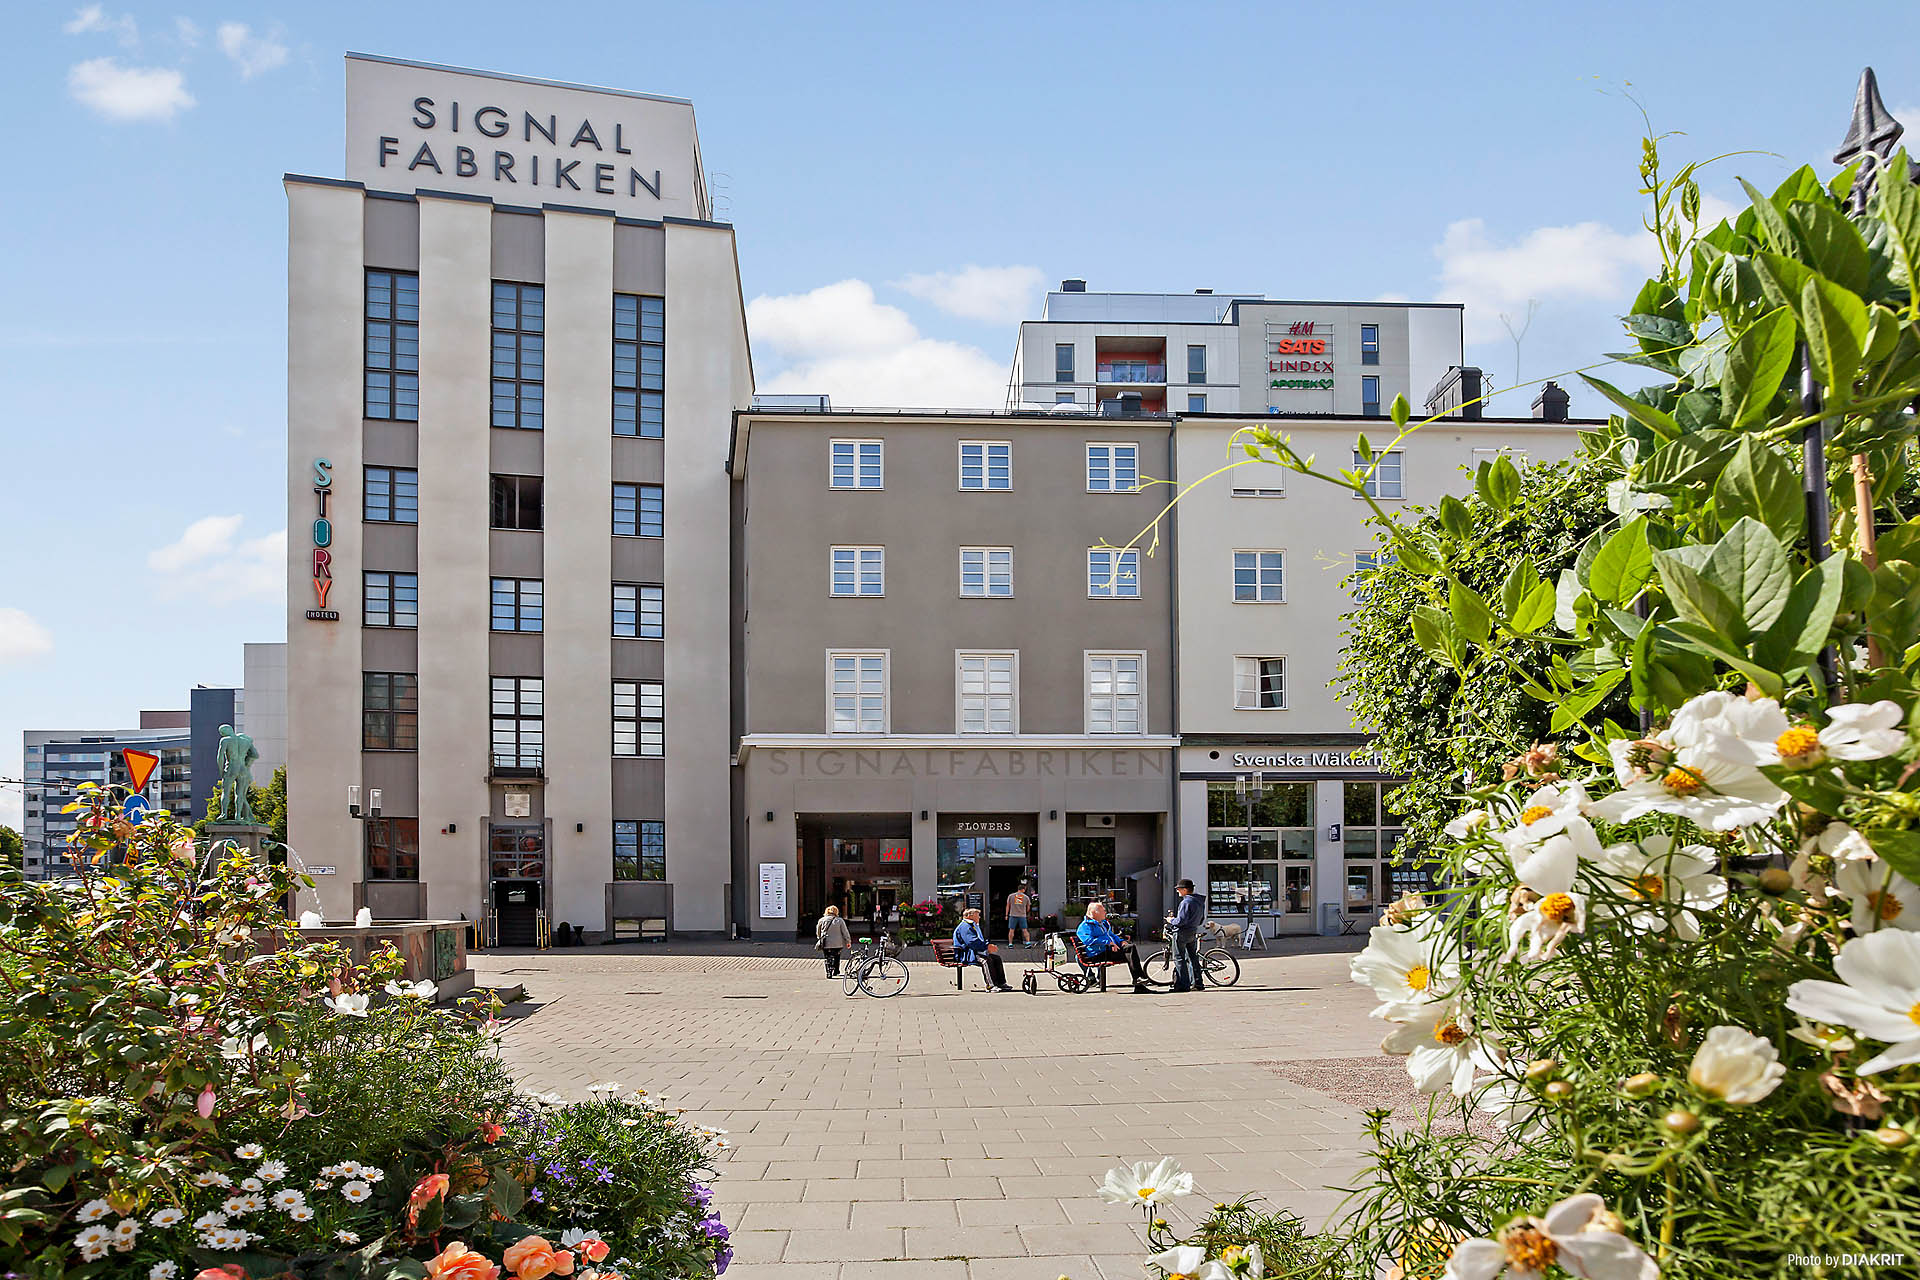 Signal Fabriken Sundbyberg